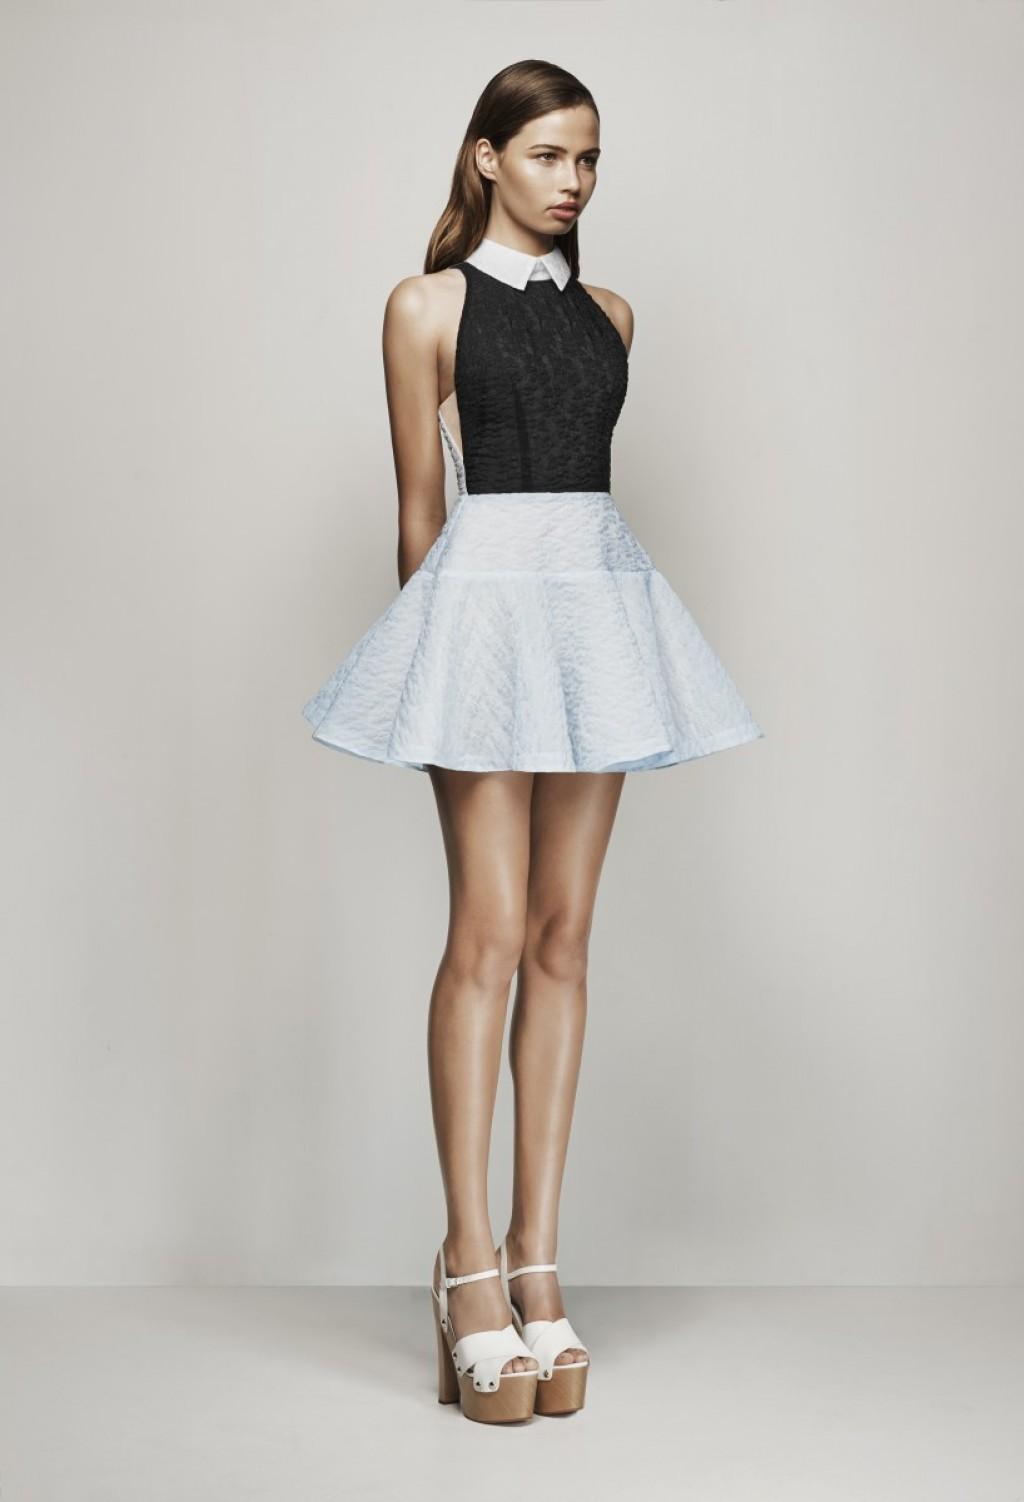 White mini cocktail dress